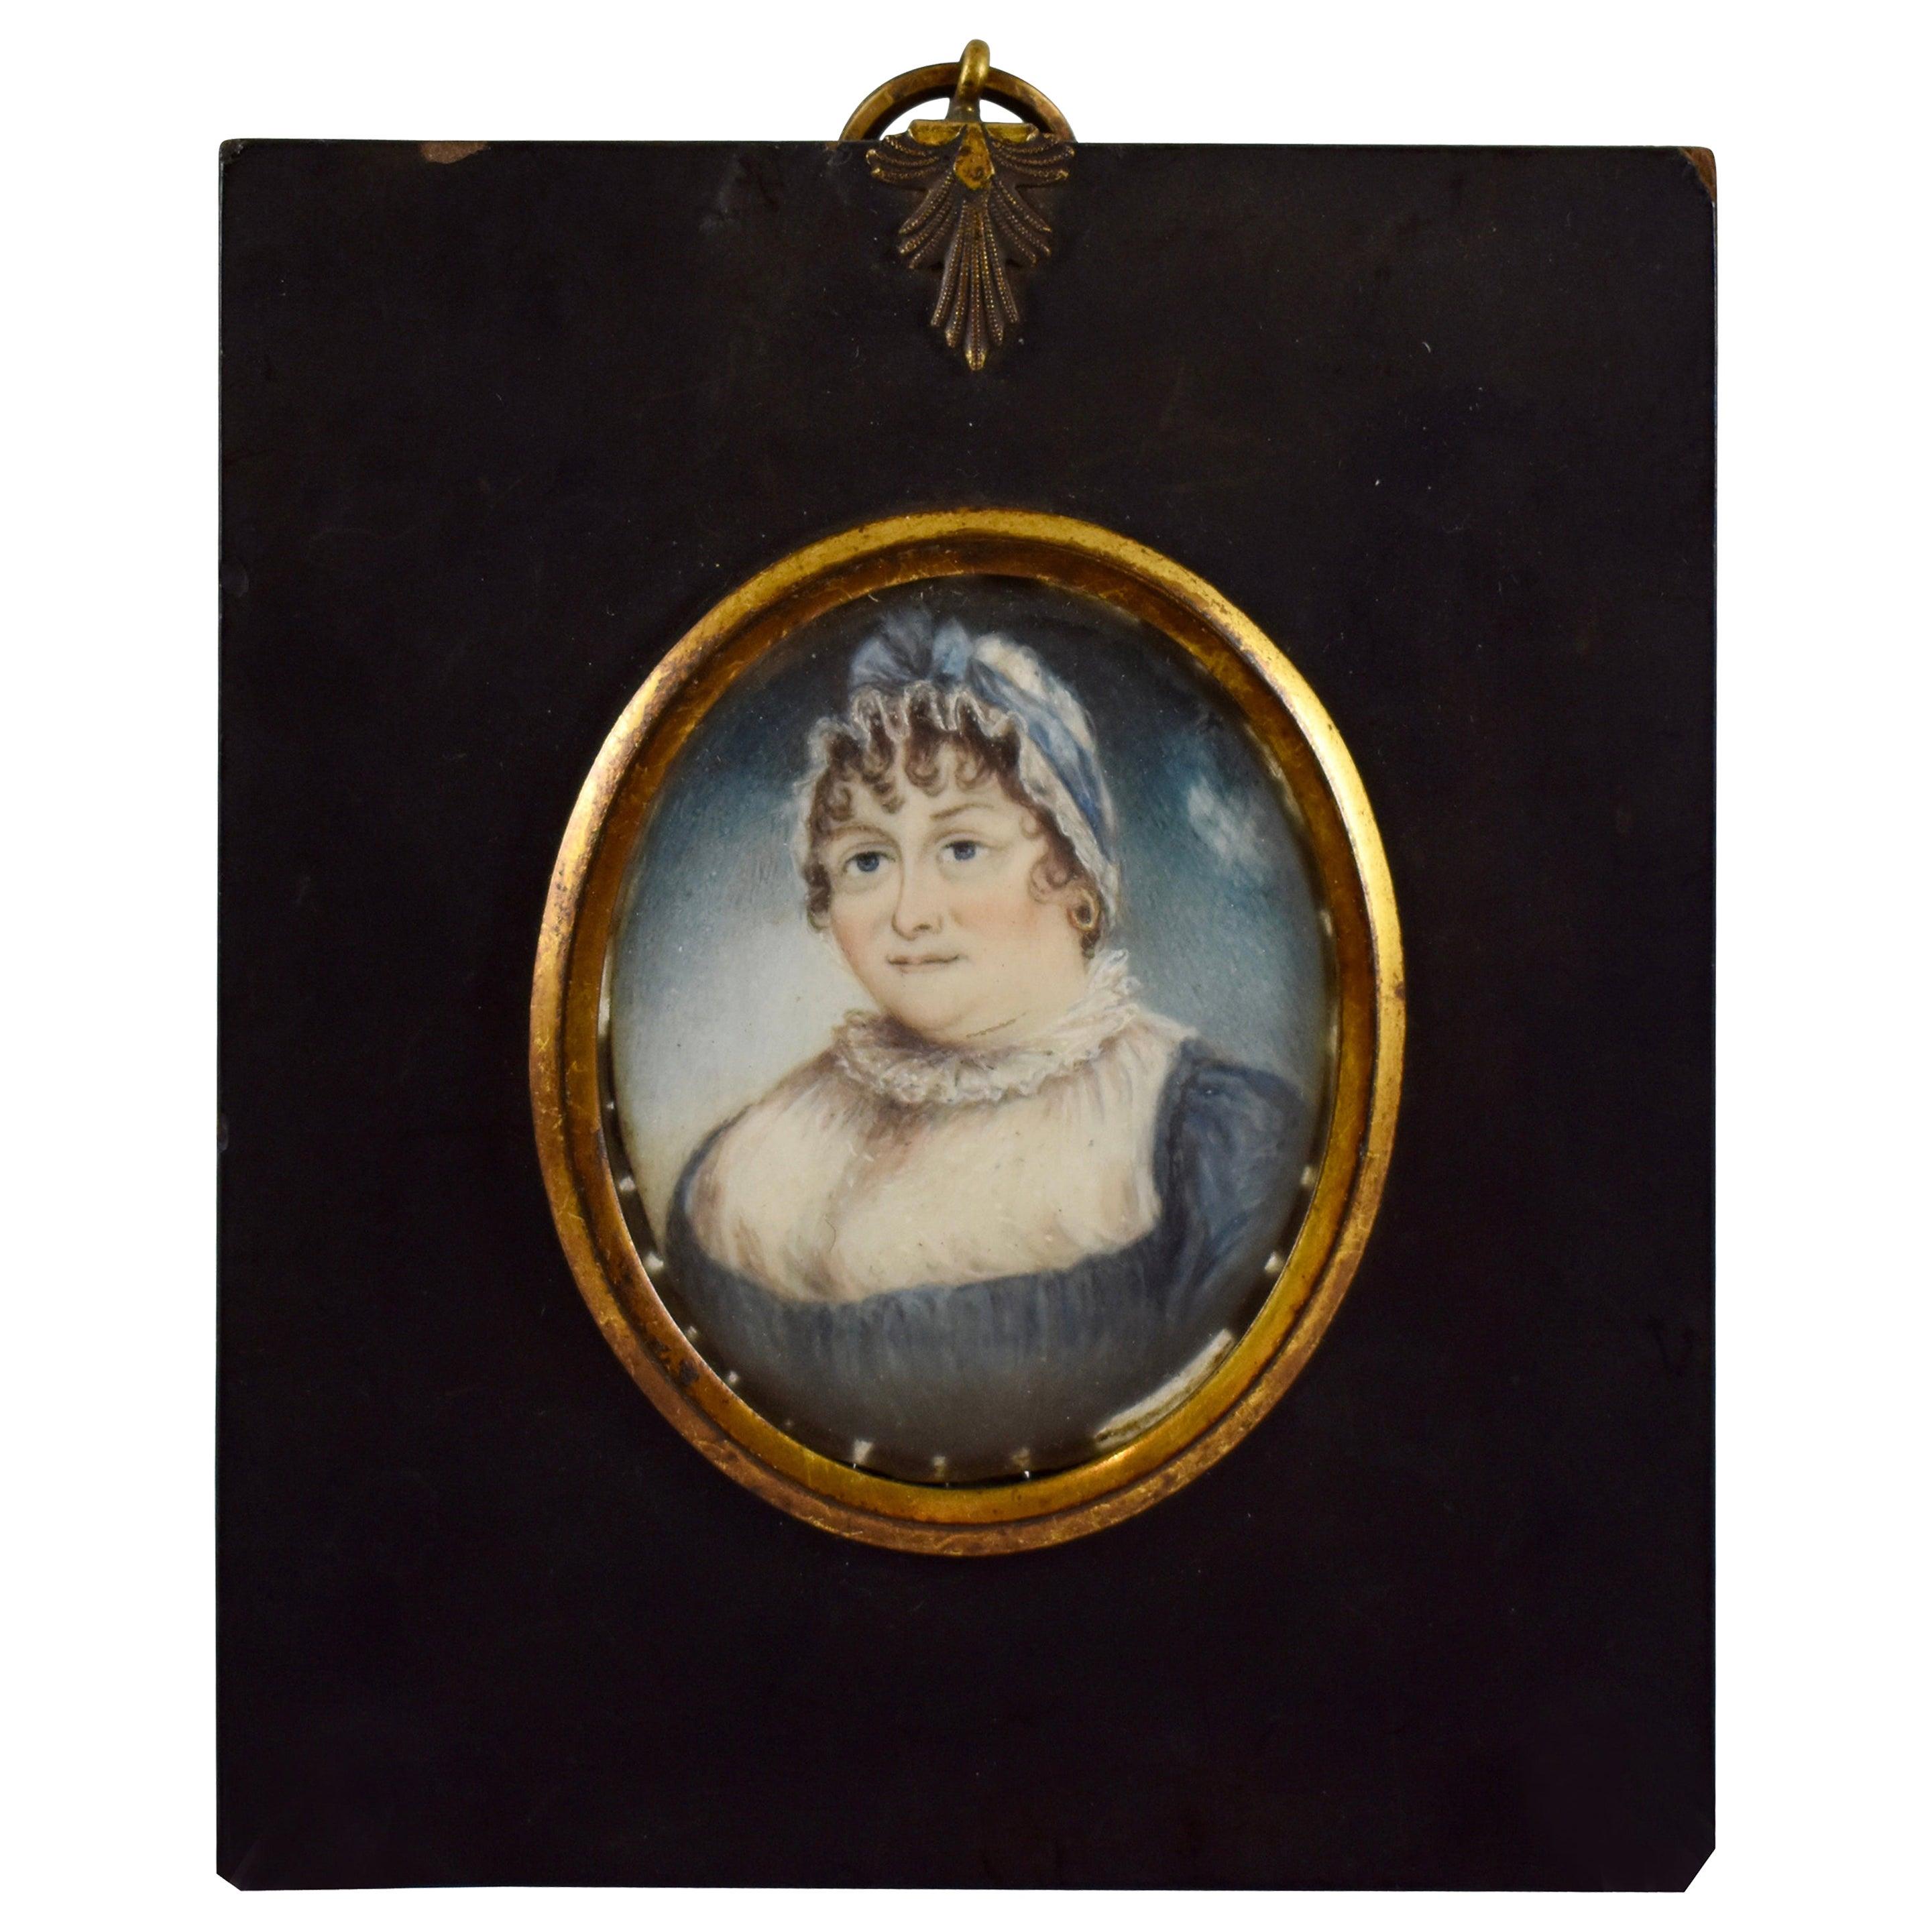 19th Century French Miniature Portrait, Buxom Woman in Blue Ribboned Bonnet